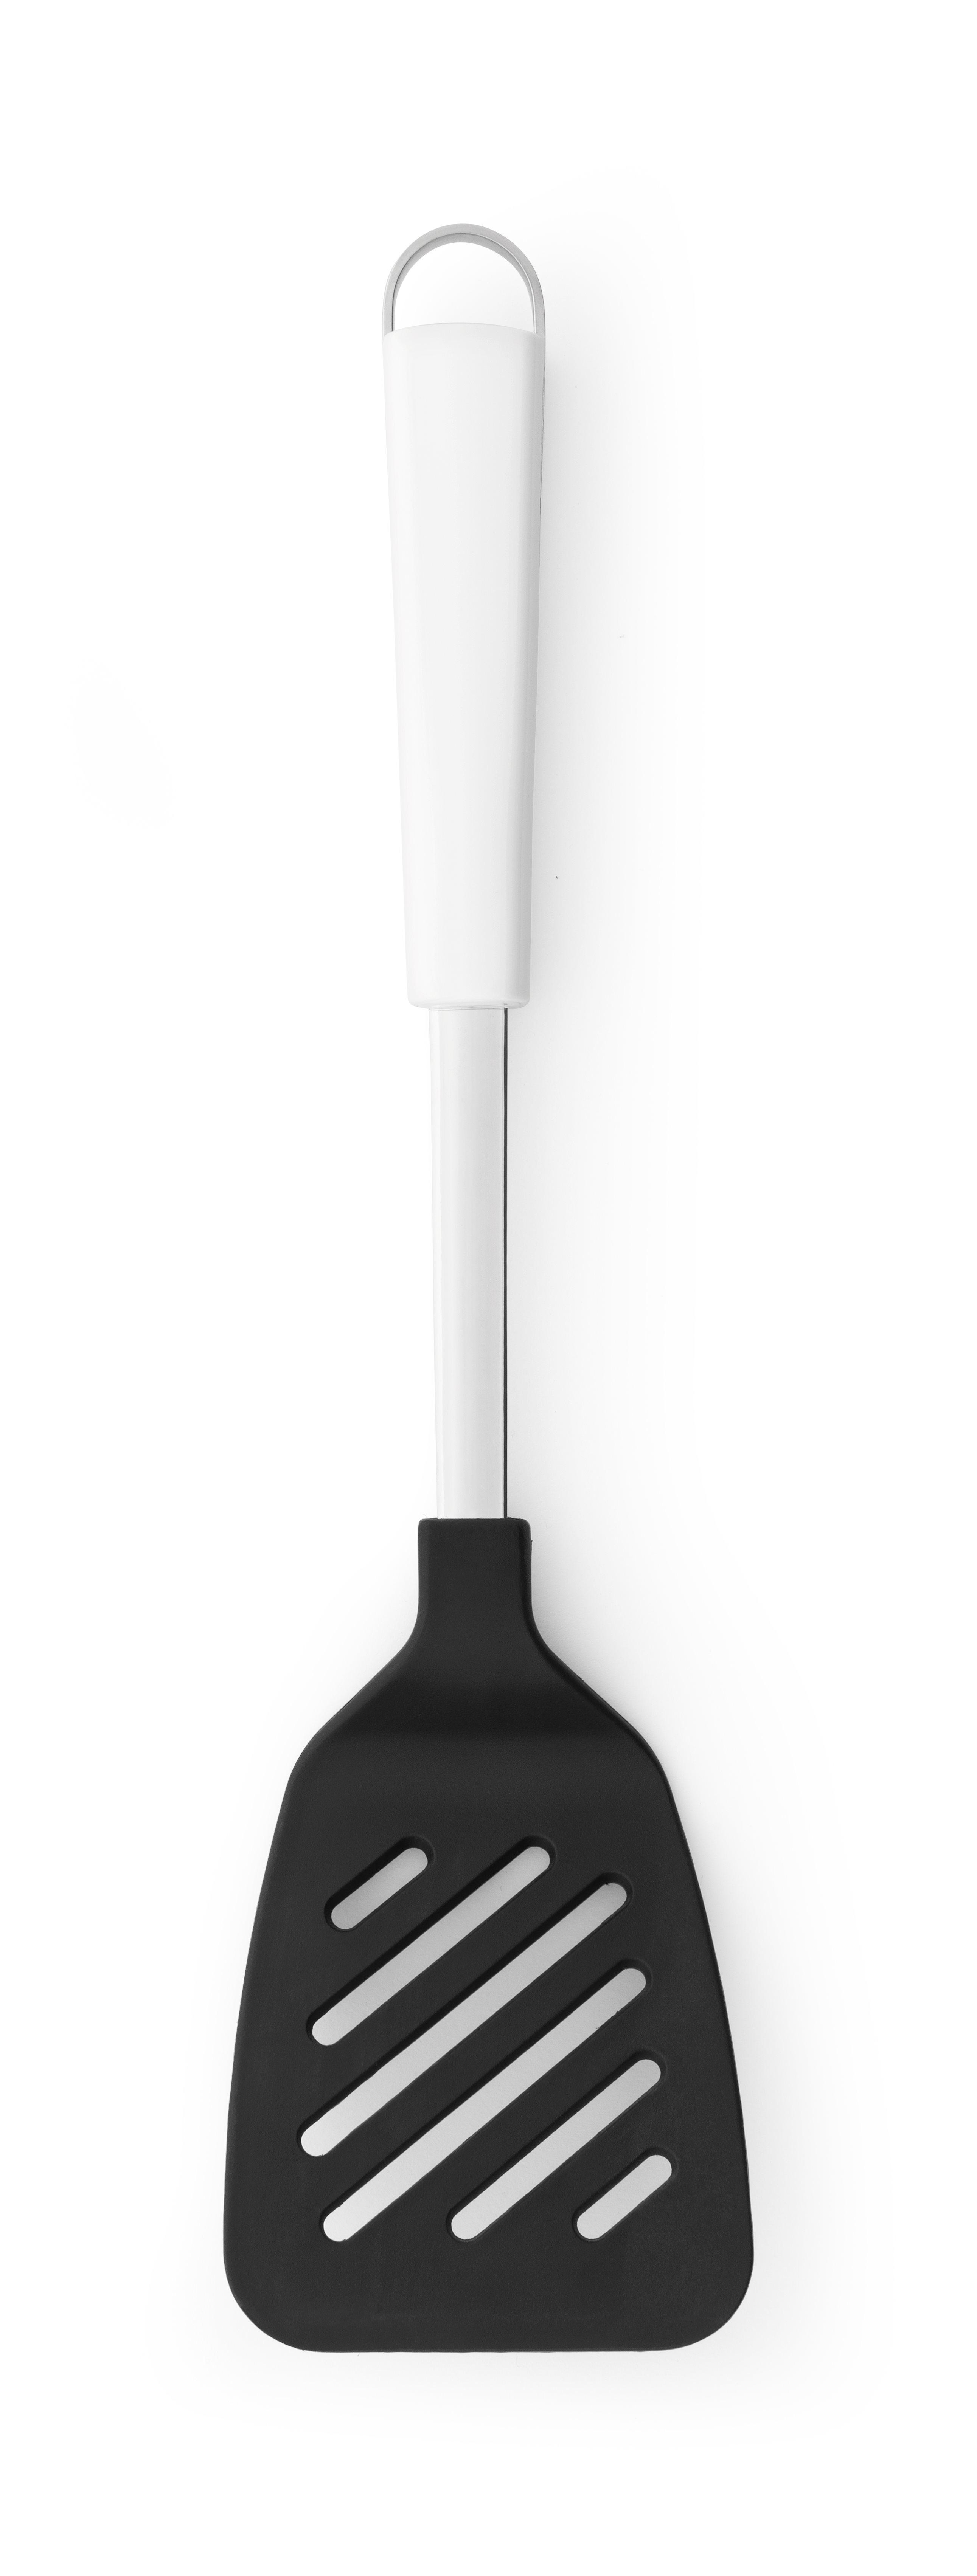 BRABANTIA Σπάτουλα Τρυπητή με Λευκή Λαβή ESSENTIAL LINE - 080.4004/69